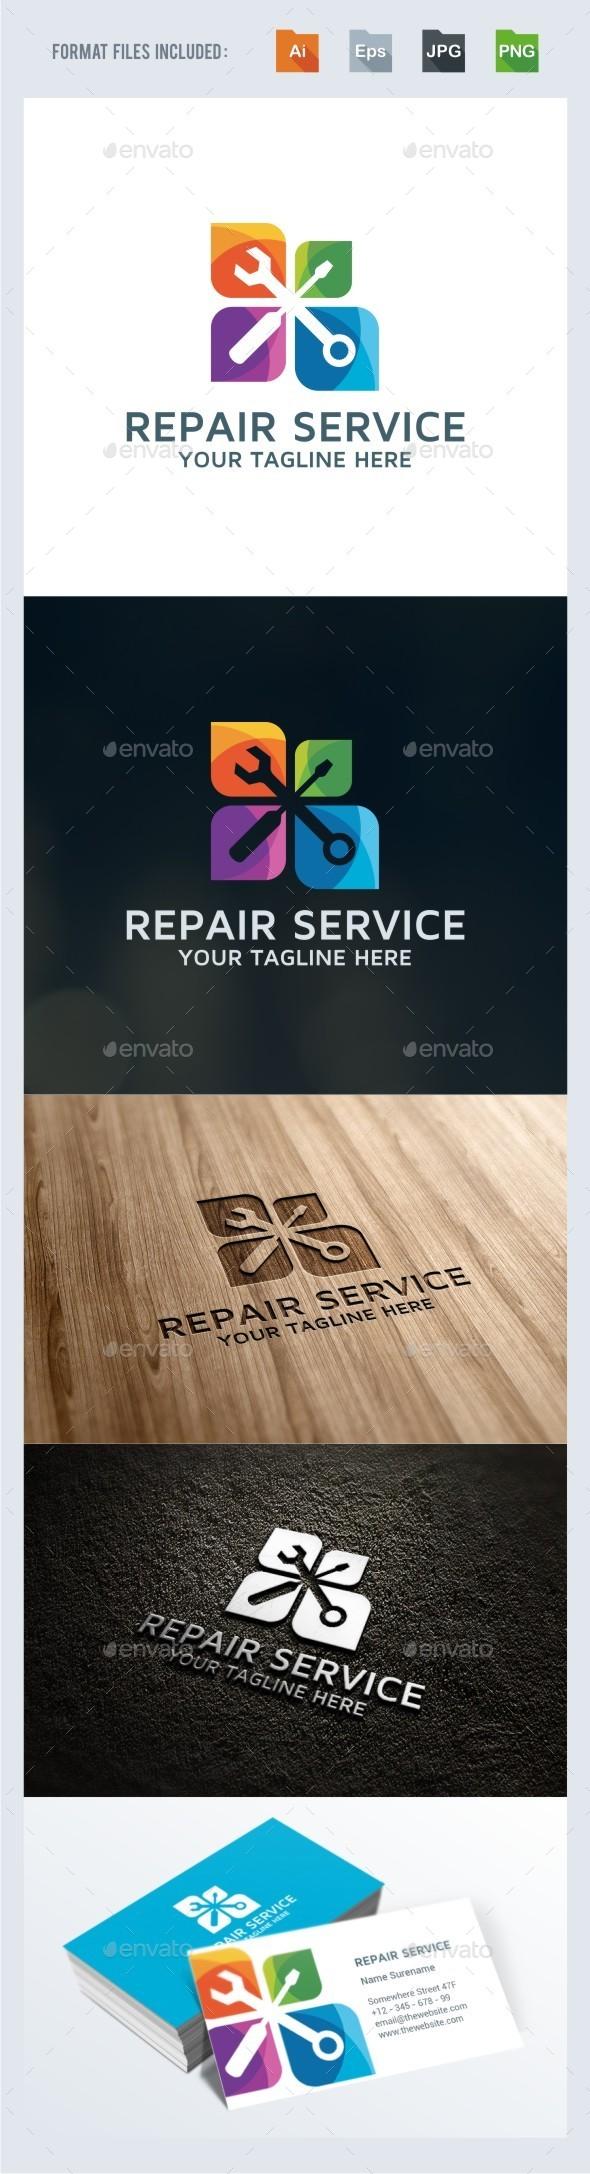 Repair Services Logo Template - Vector Abstract